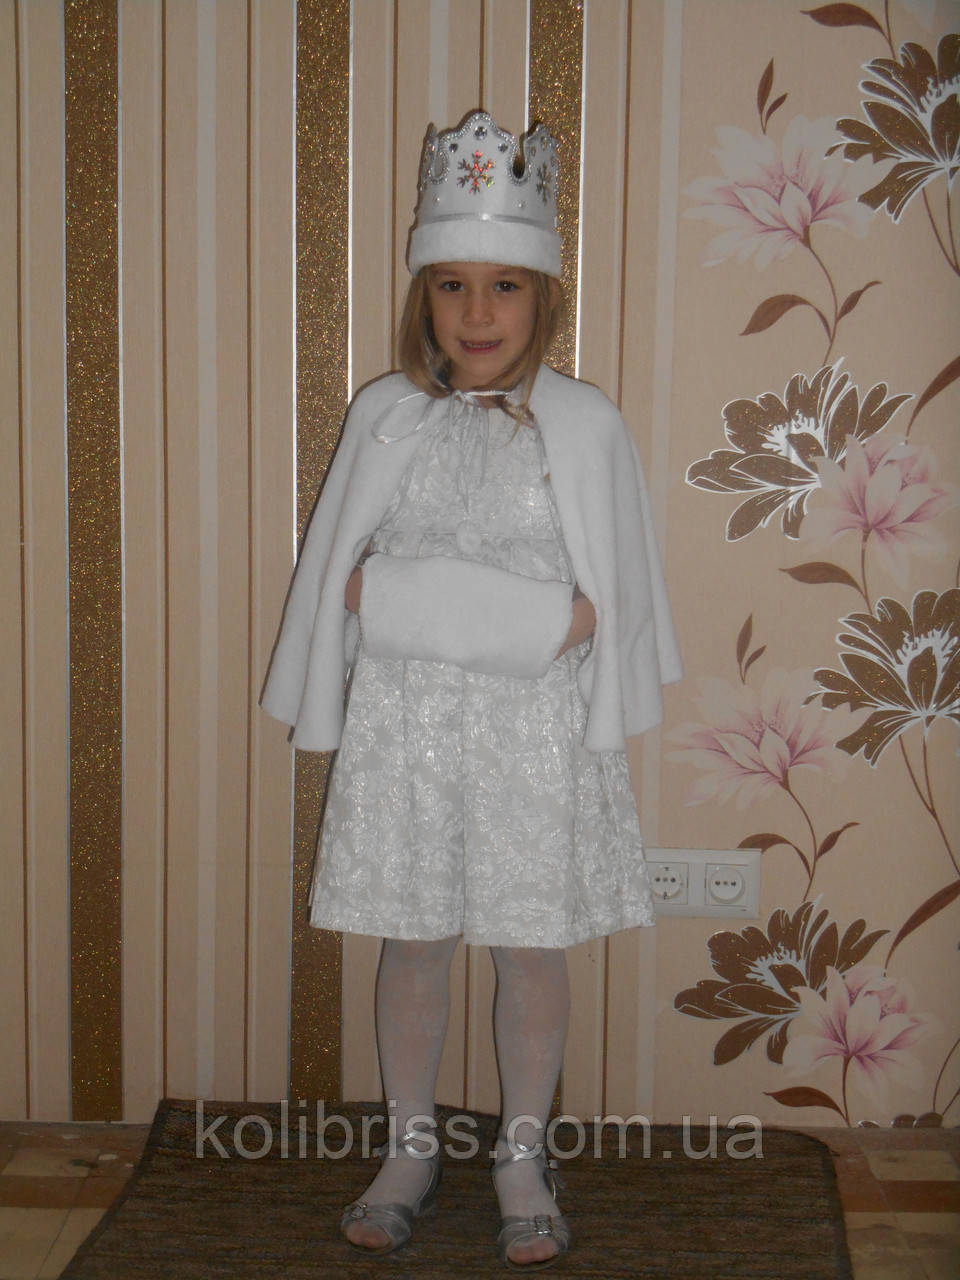 Костюм снегурочки в белом. Детский костюм снегурочка прокат Киев